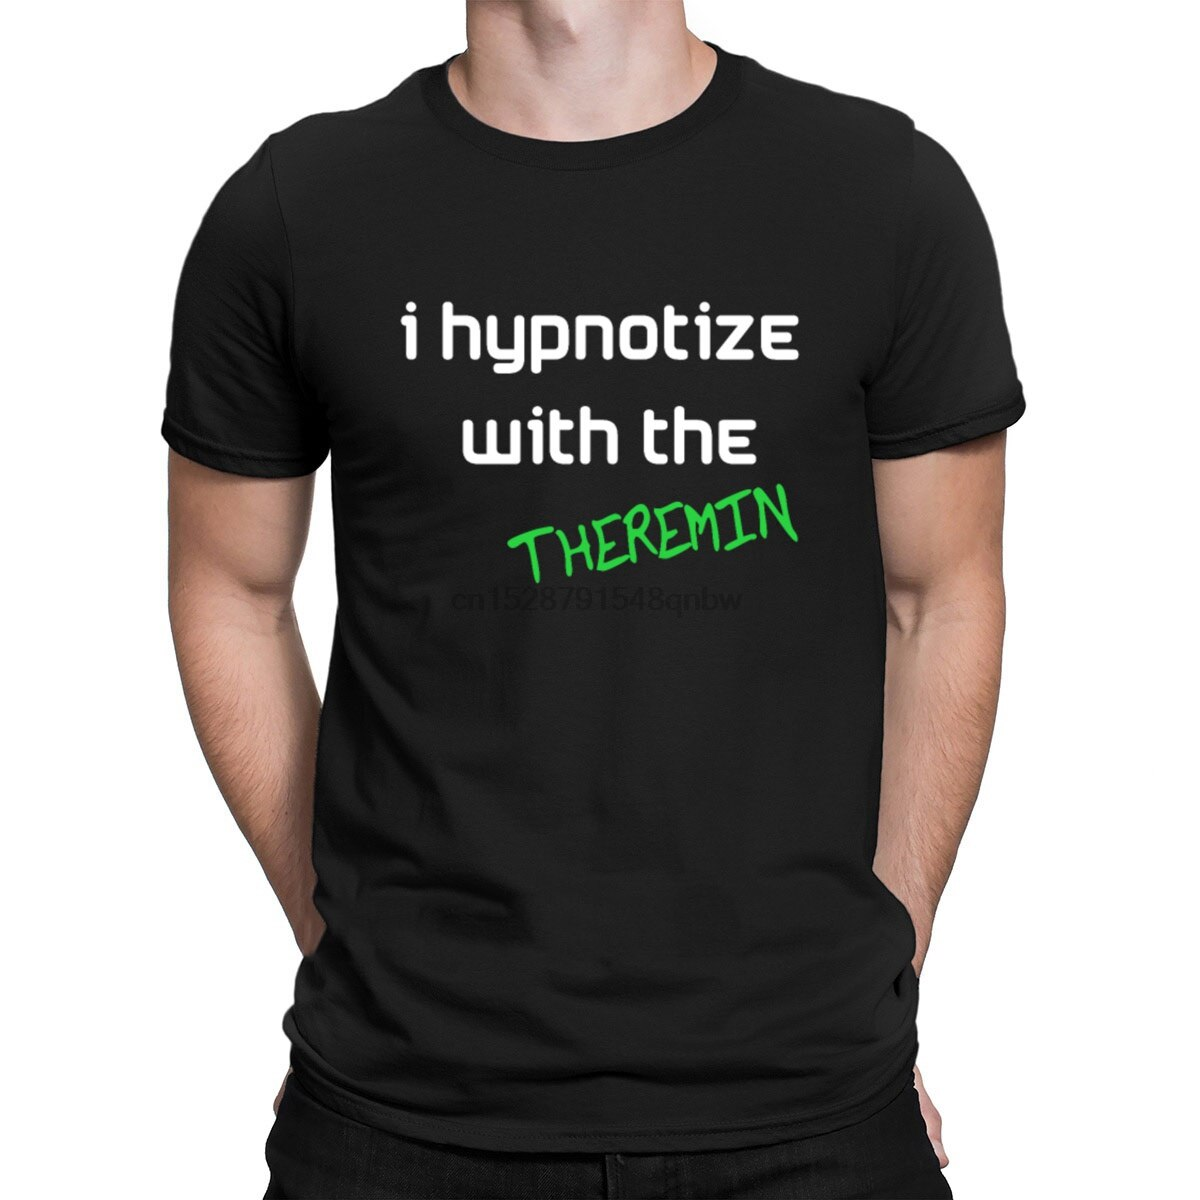 Camiseta orgánica de Theremins de manga corta de moda S-3xl de Fitness personalizada camiseta de Color sólido de la vendimia orgánica Theremin